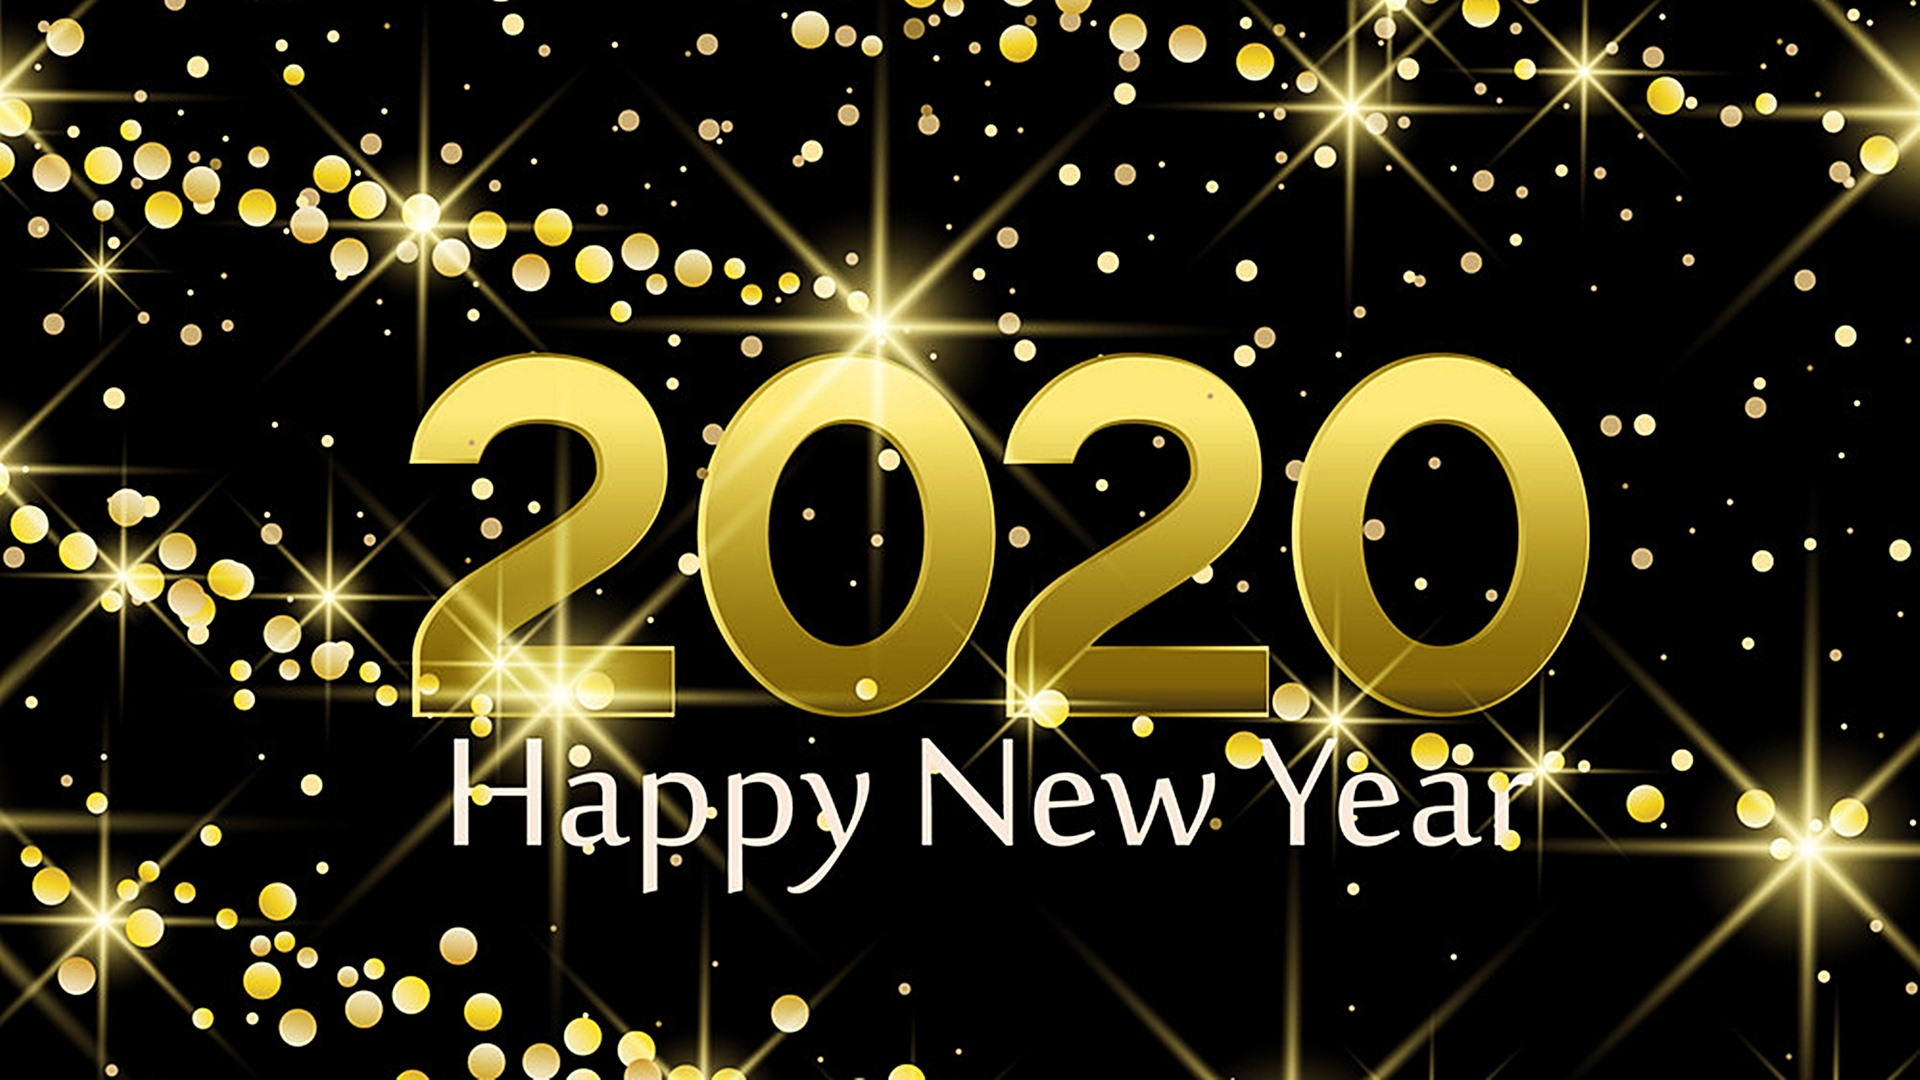 Osho Hd Wallpaper 2020 Wallpaper Animated 2020 Wallpaper 34589